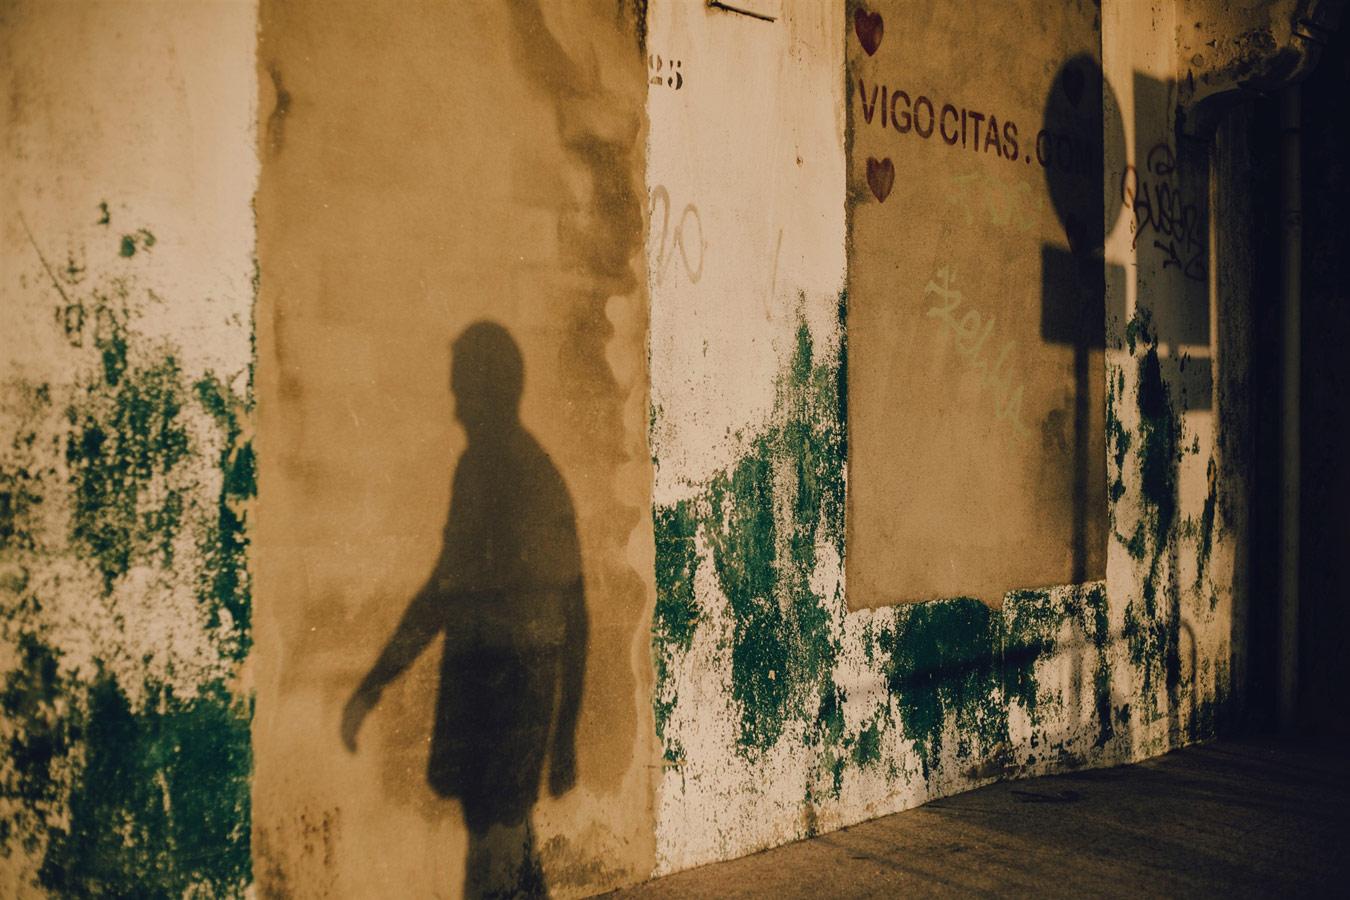 © Tiberio Ventura, Shadow, Camino de Santiago, Photography 12 x 17, The Chelsea International Photography Competition